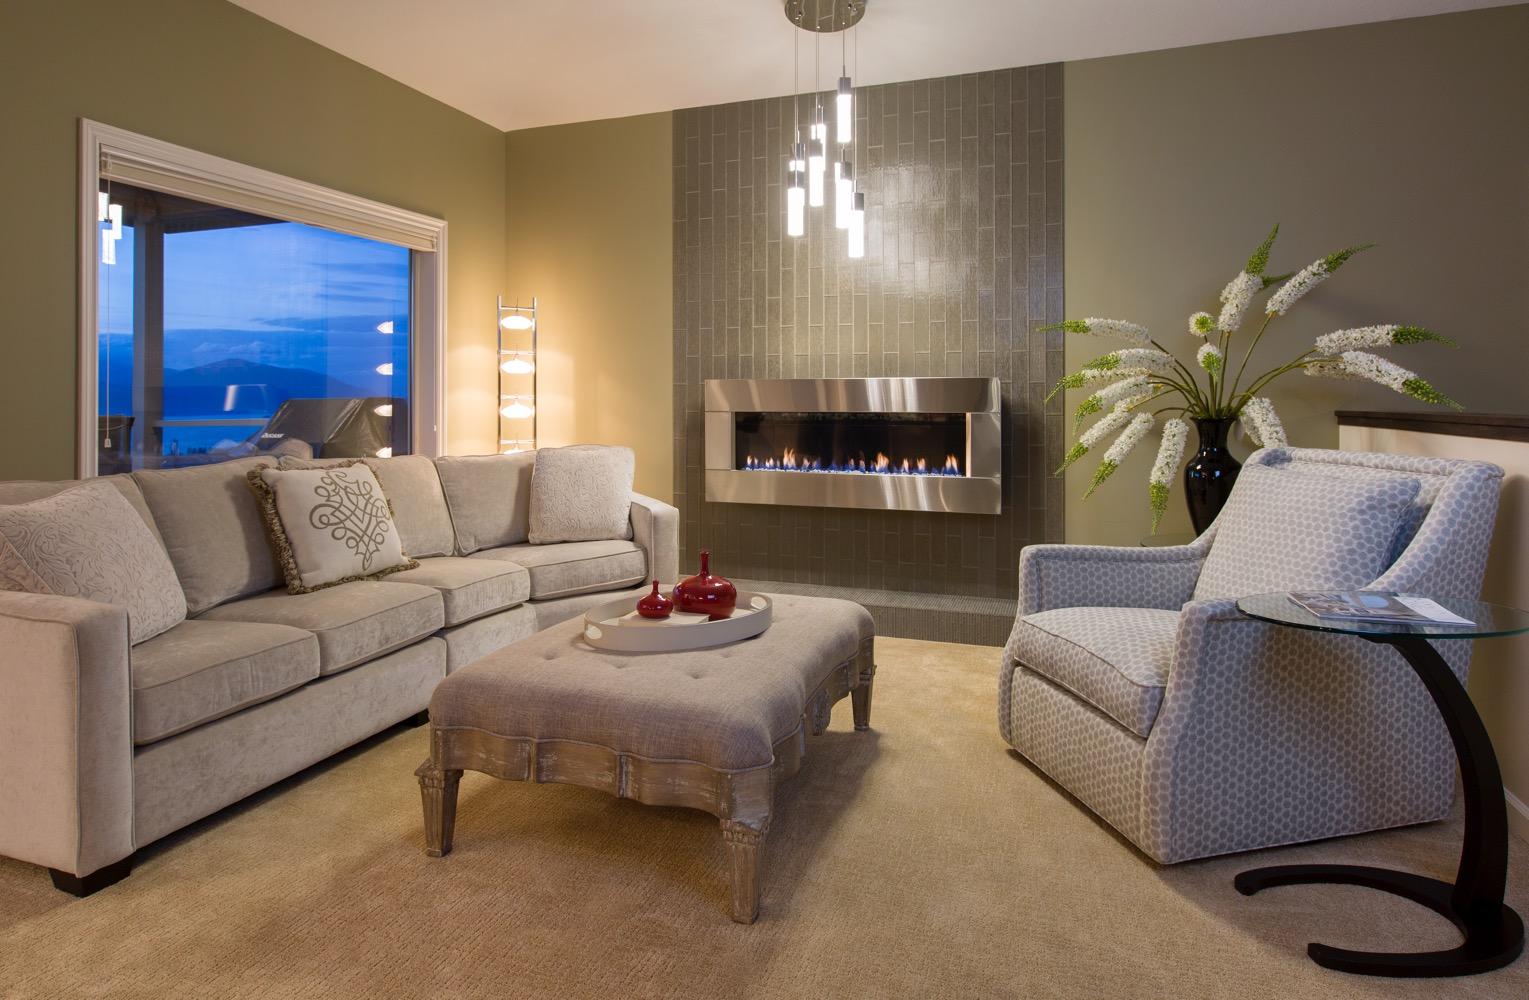 Interior Design Kelowna - Elegant living room with fireplace